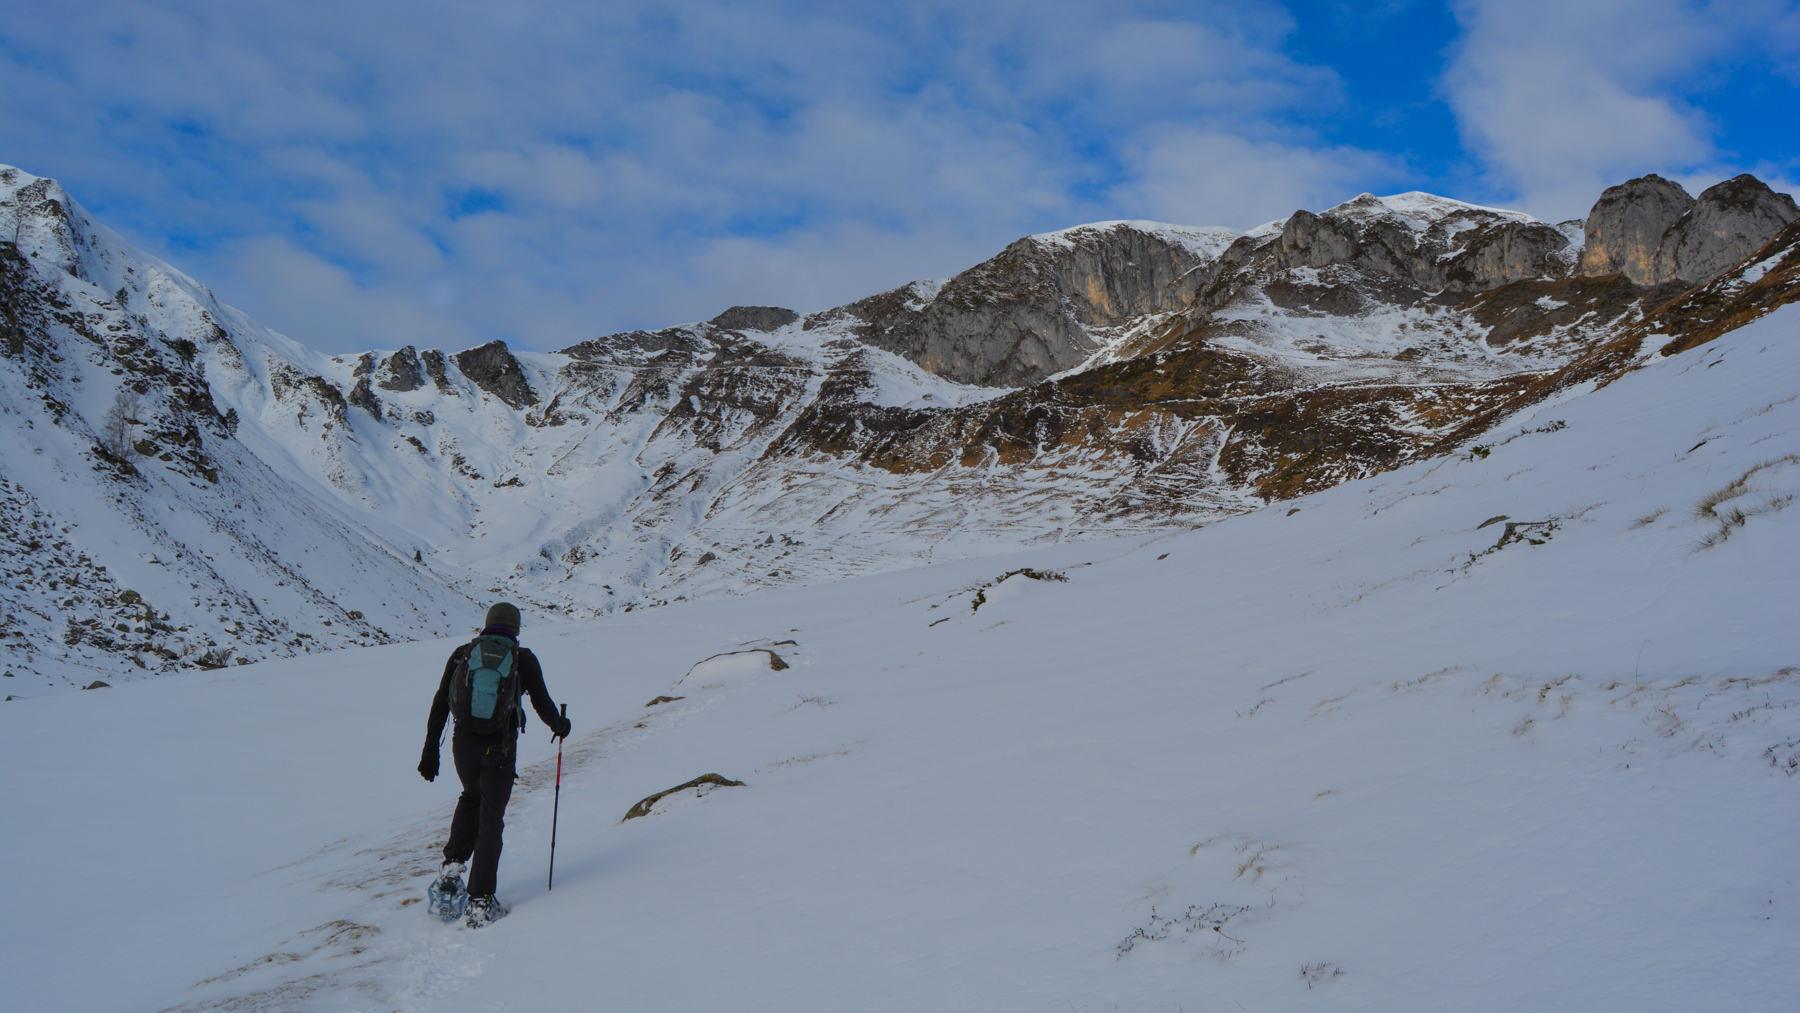 Ariège sous la neige, enfin ! 6